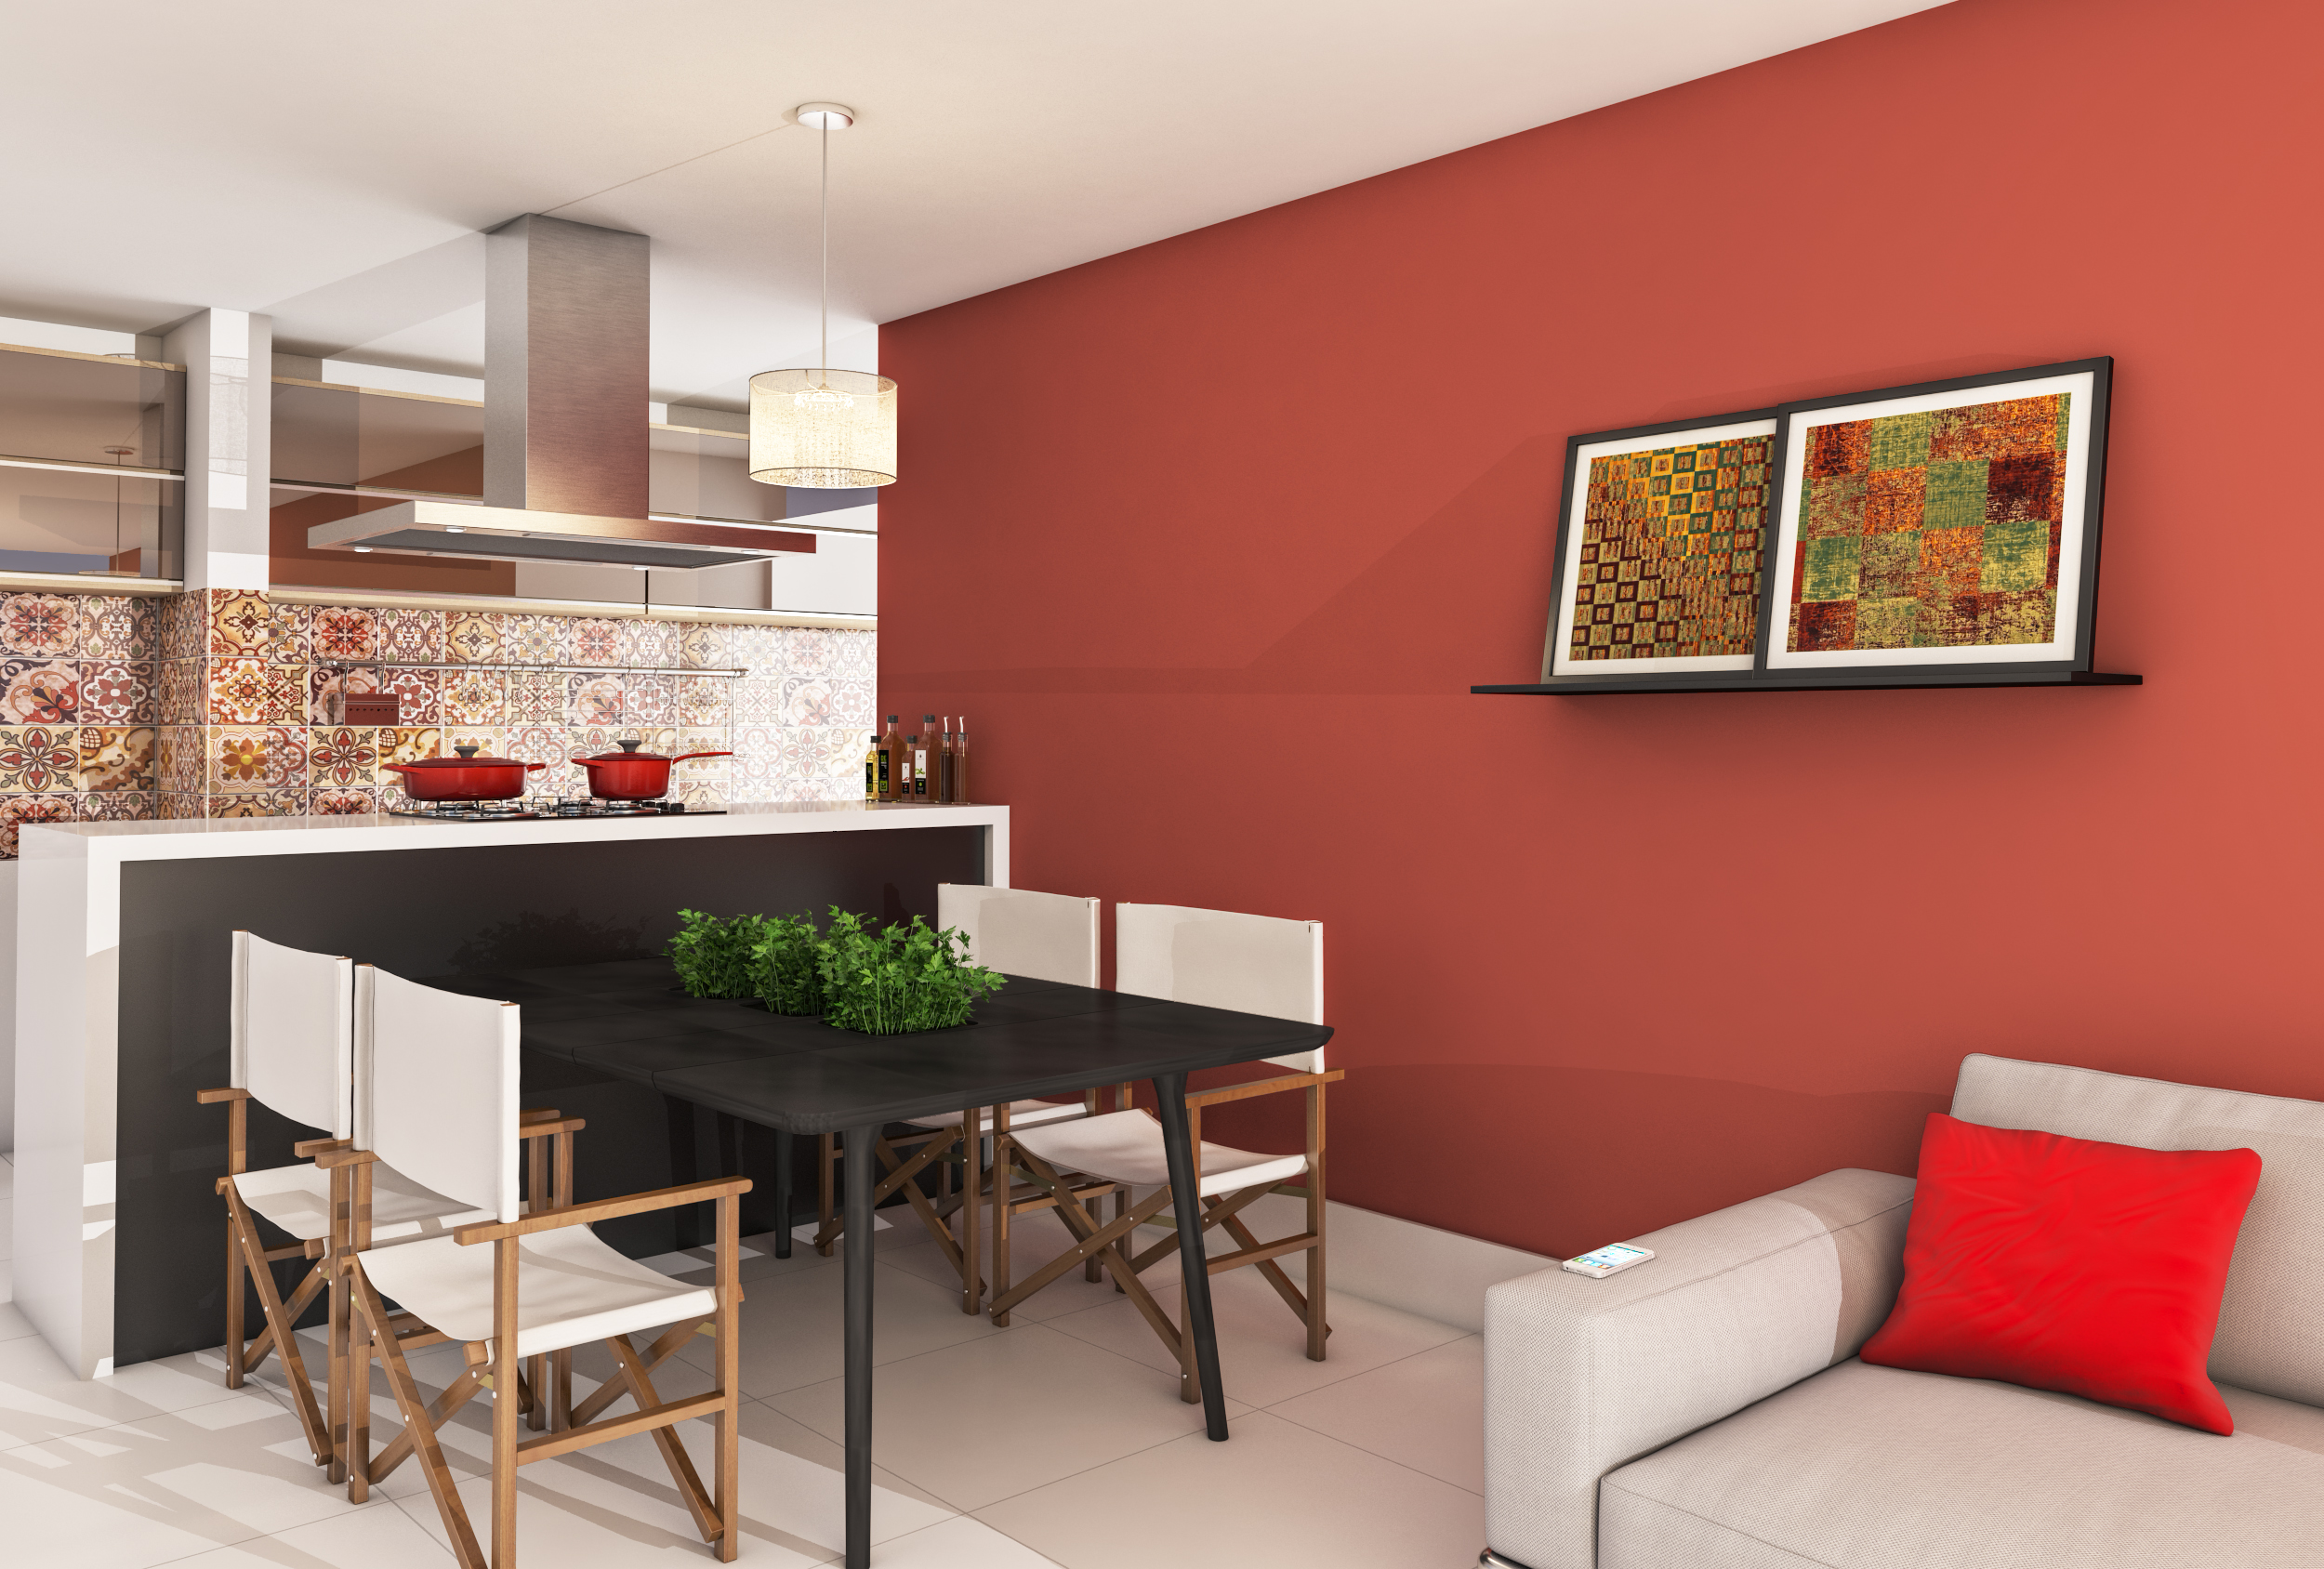 Sala De Jantar Com Parede Colorida Leroy Merlin -> Acabamento Sala Pequena